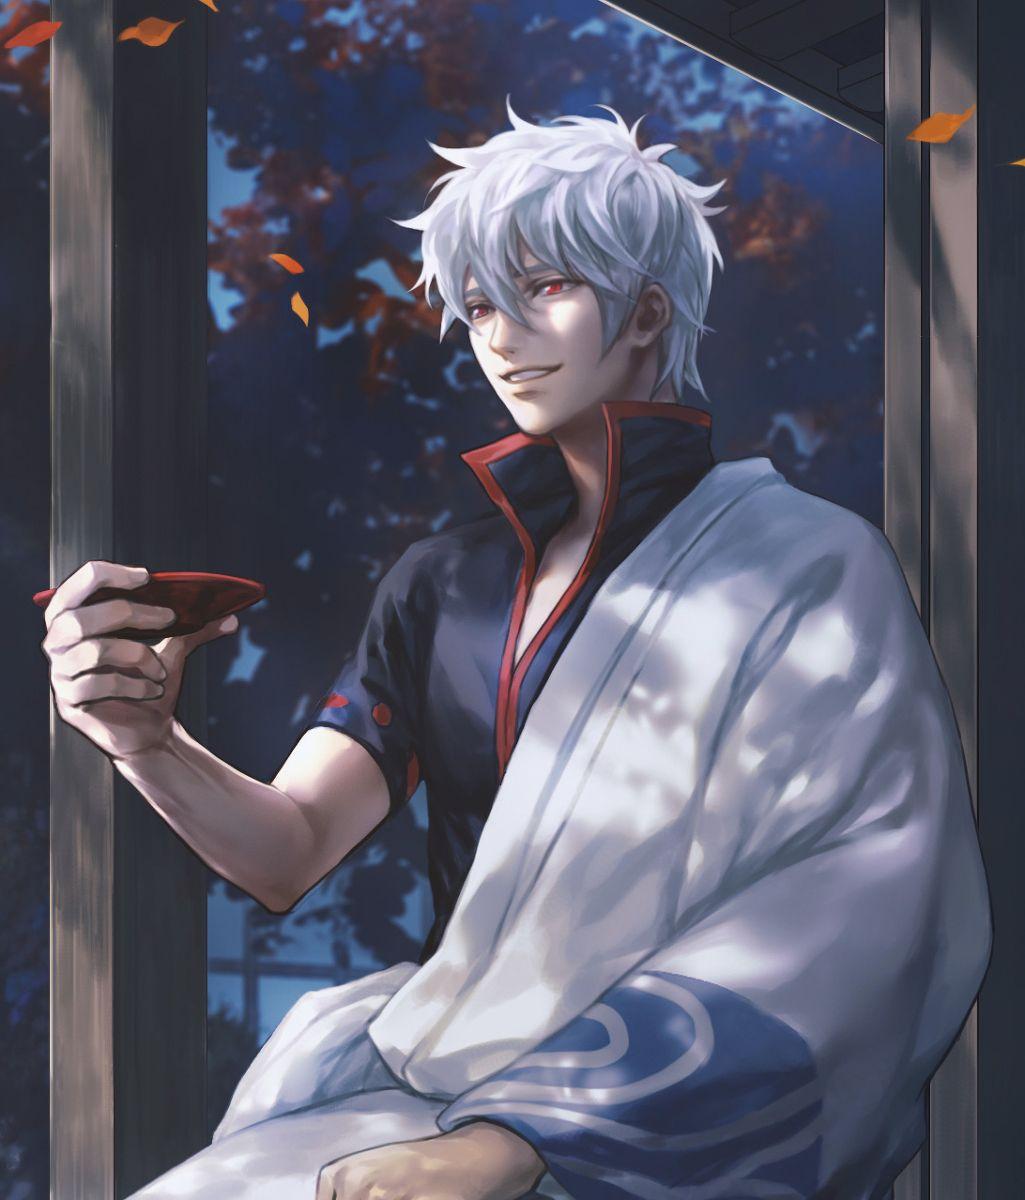 log │ MIKI努力画 (Pixiv Id 3019748) Characters:... - Anime & Manga Fandom